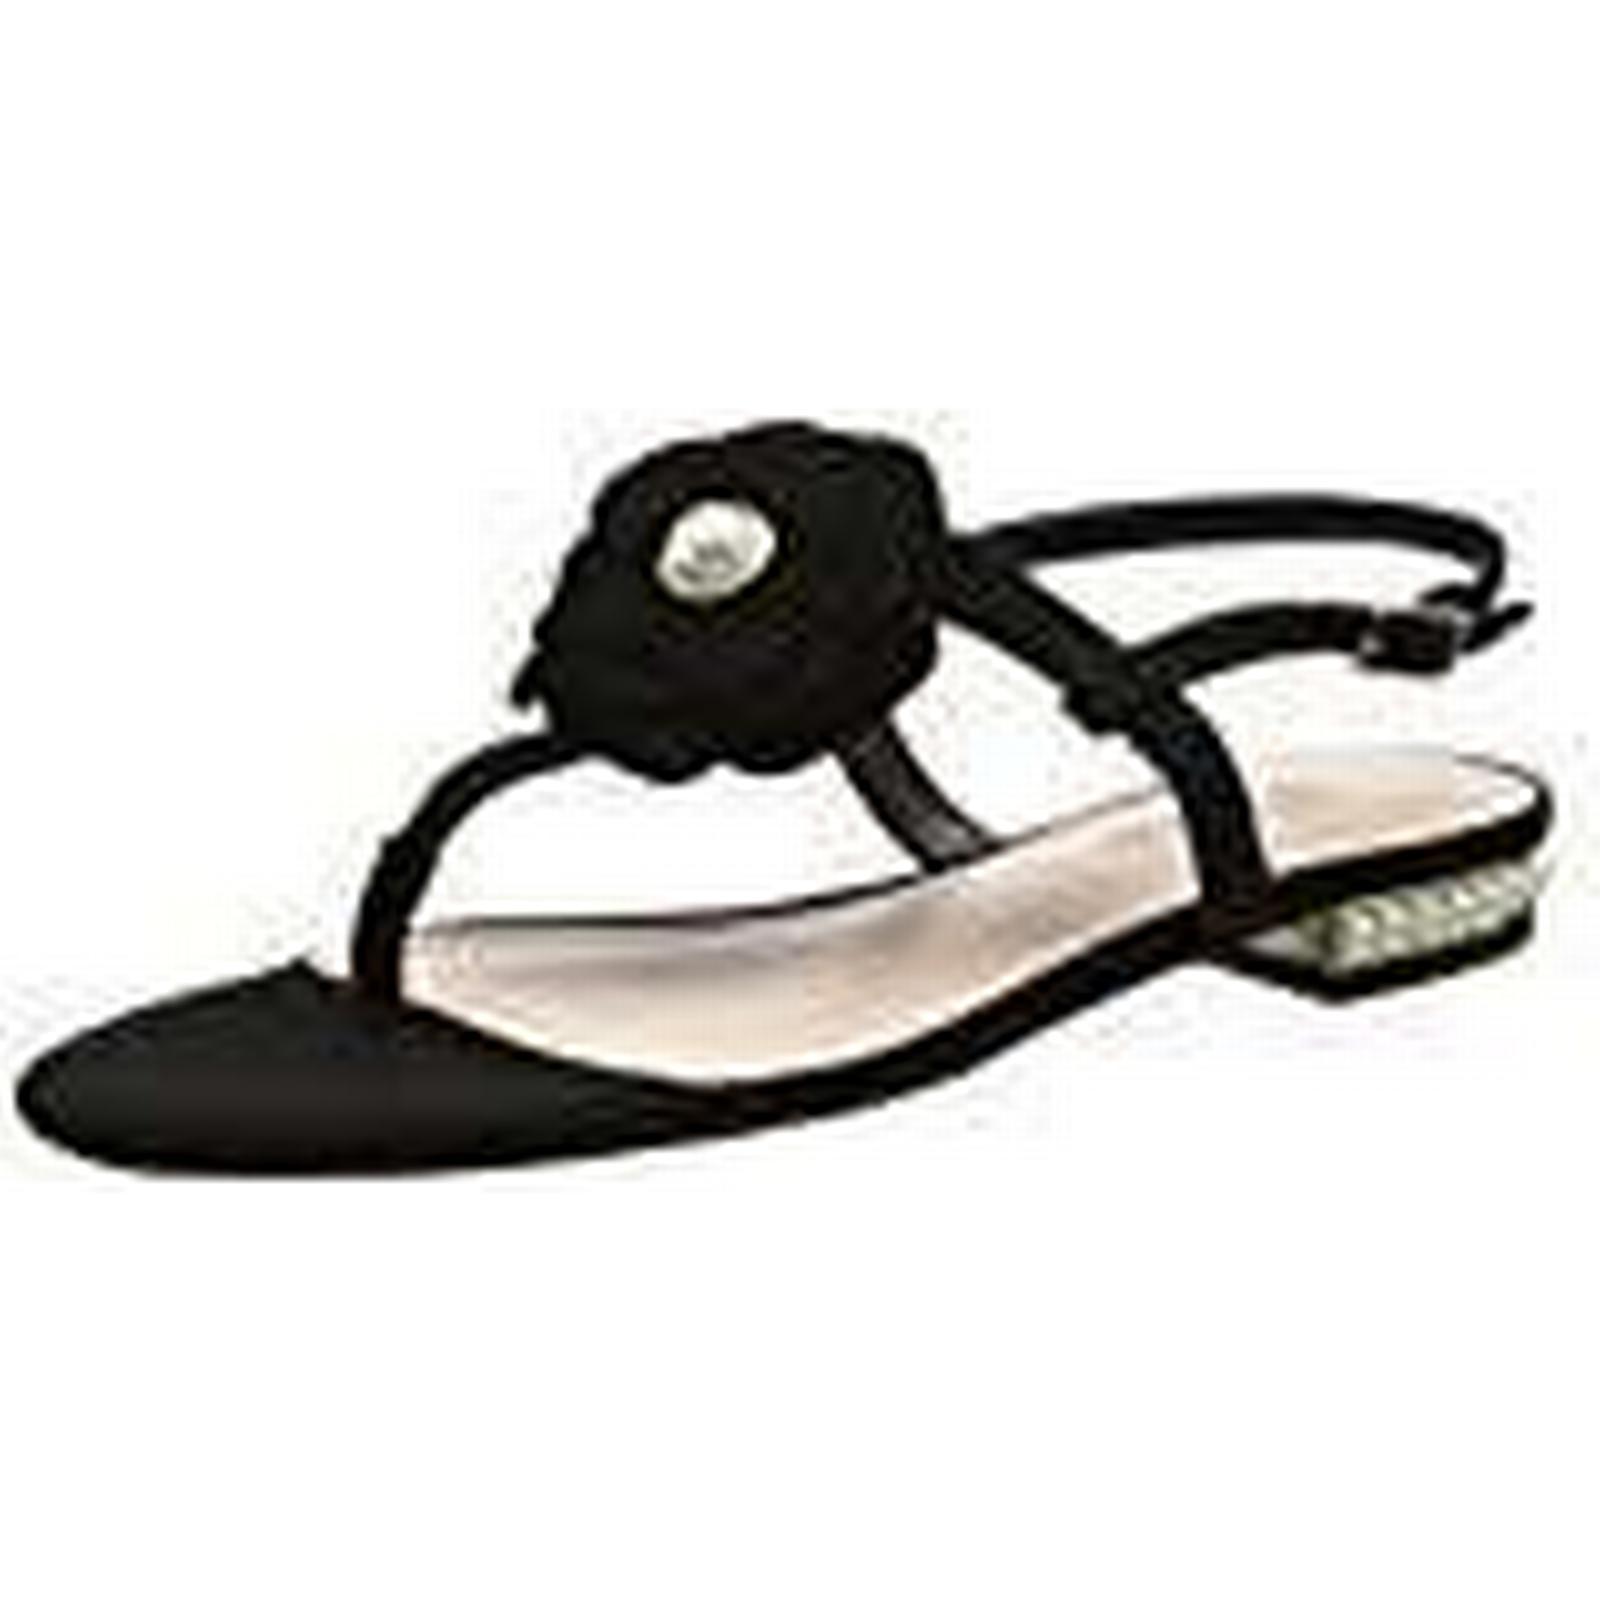 Dune Women's Nelles T-Bar Sandals, EU (Black), 6 UK 39 EU Sandals, cb672a